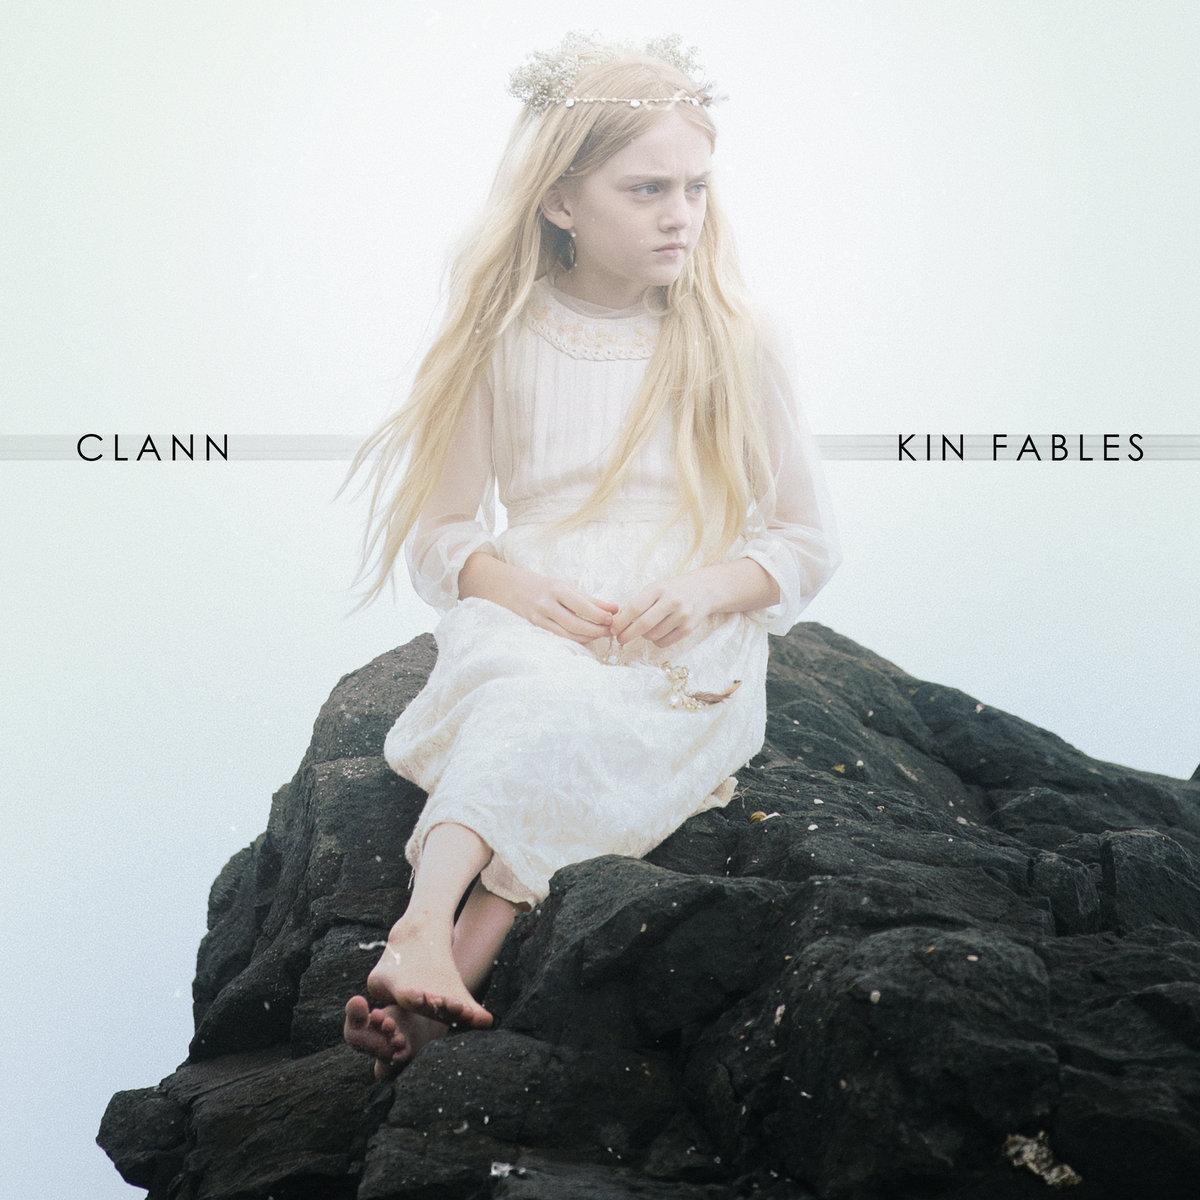 Album: KIN Fables  Artist: CLANN  Independent release